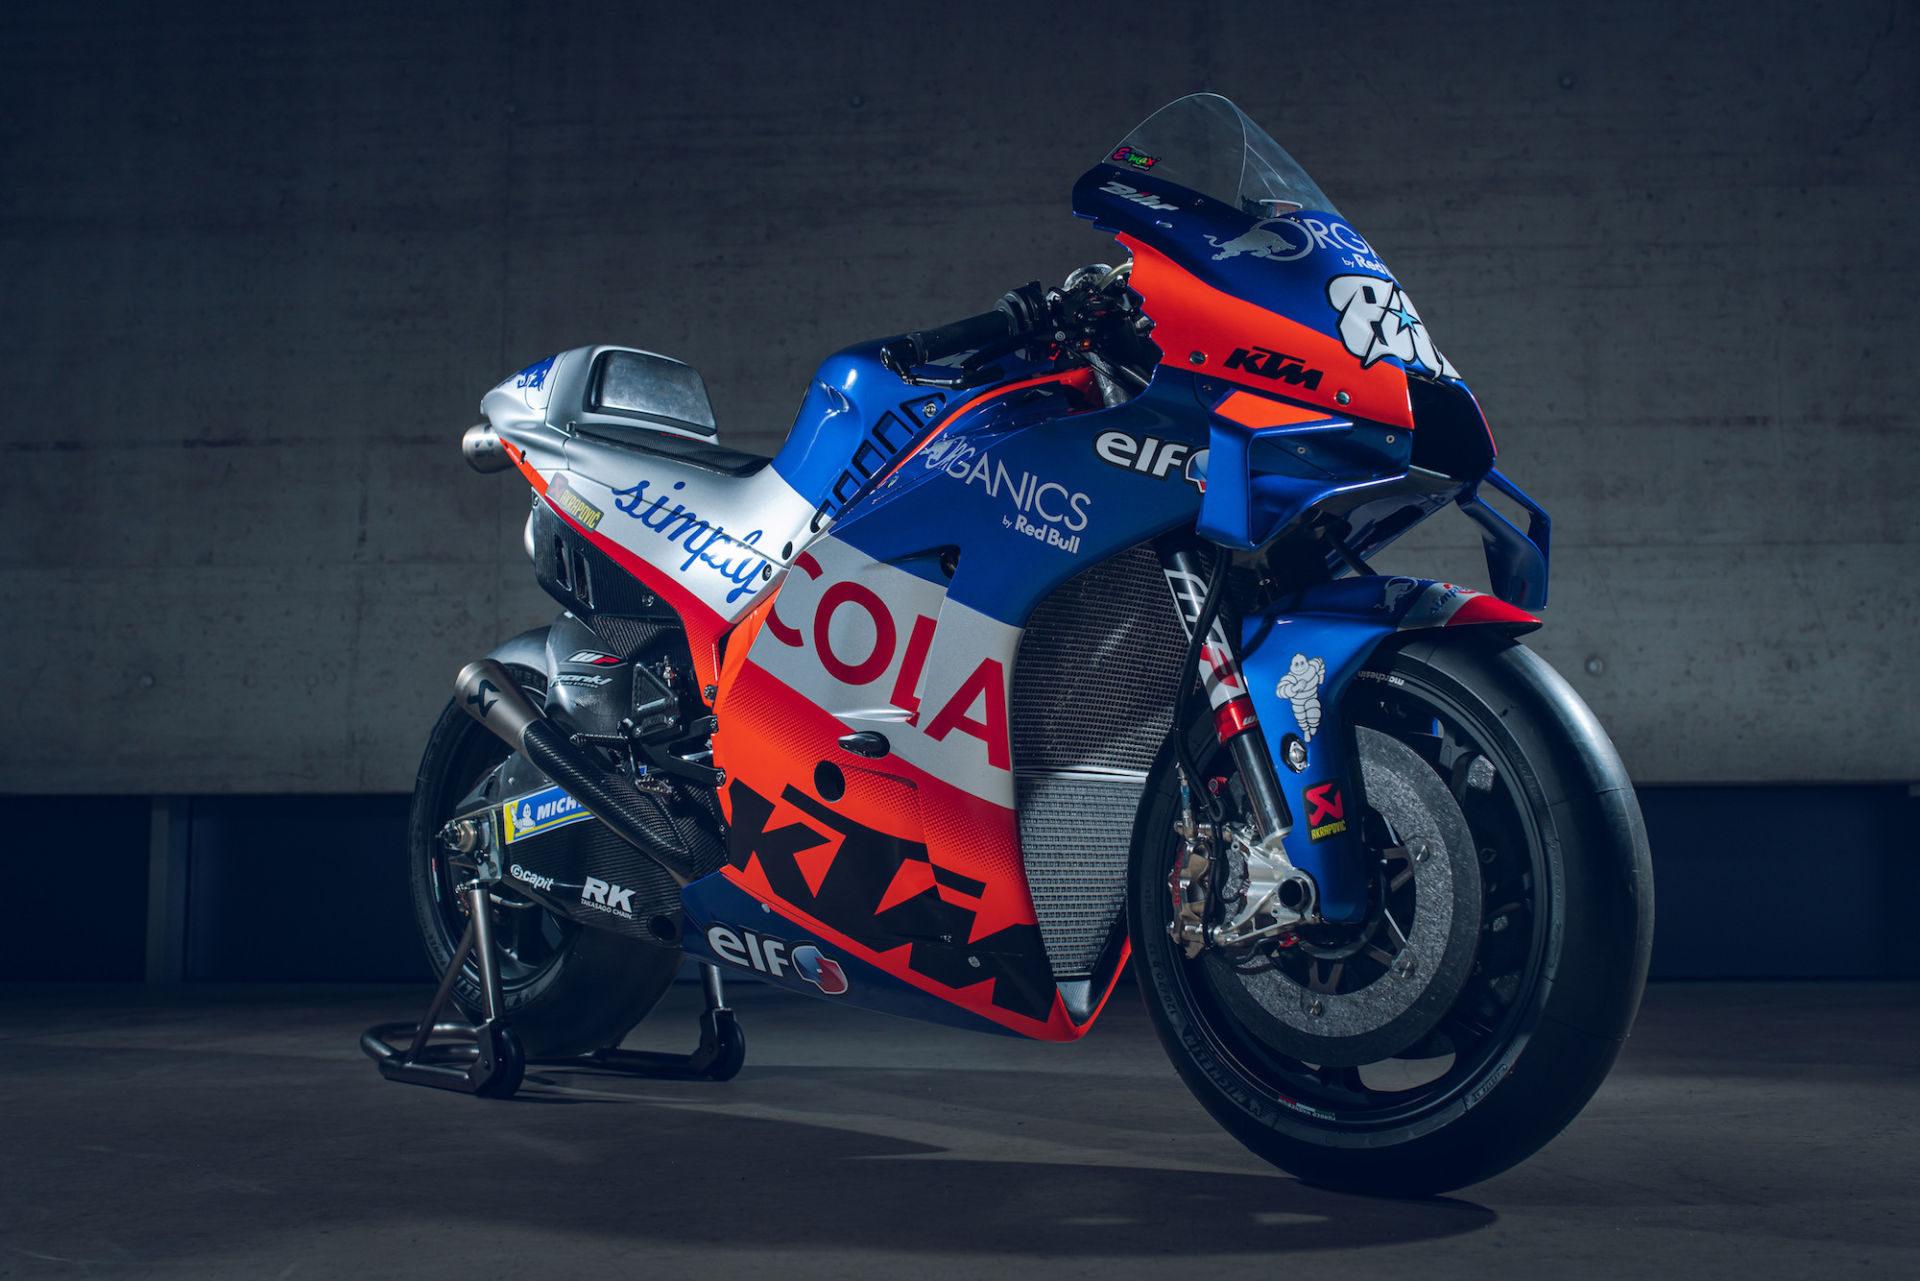 Miguel Oliveira's Red Bull KTM Tech3 RC16 MotoGP racebike. Photo by Sebas Romero, courtesy of KTM.